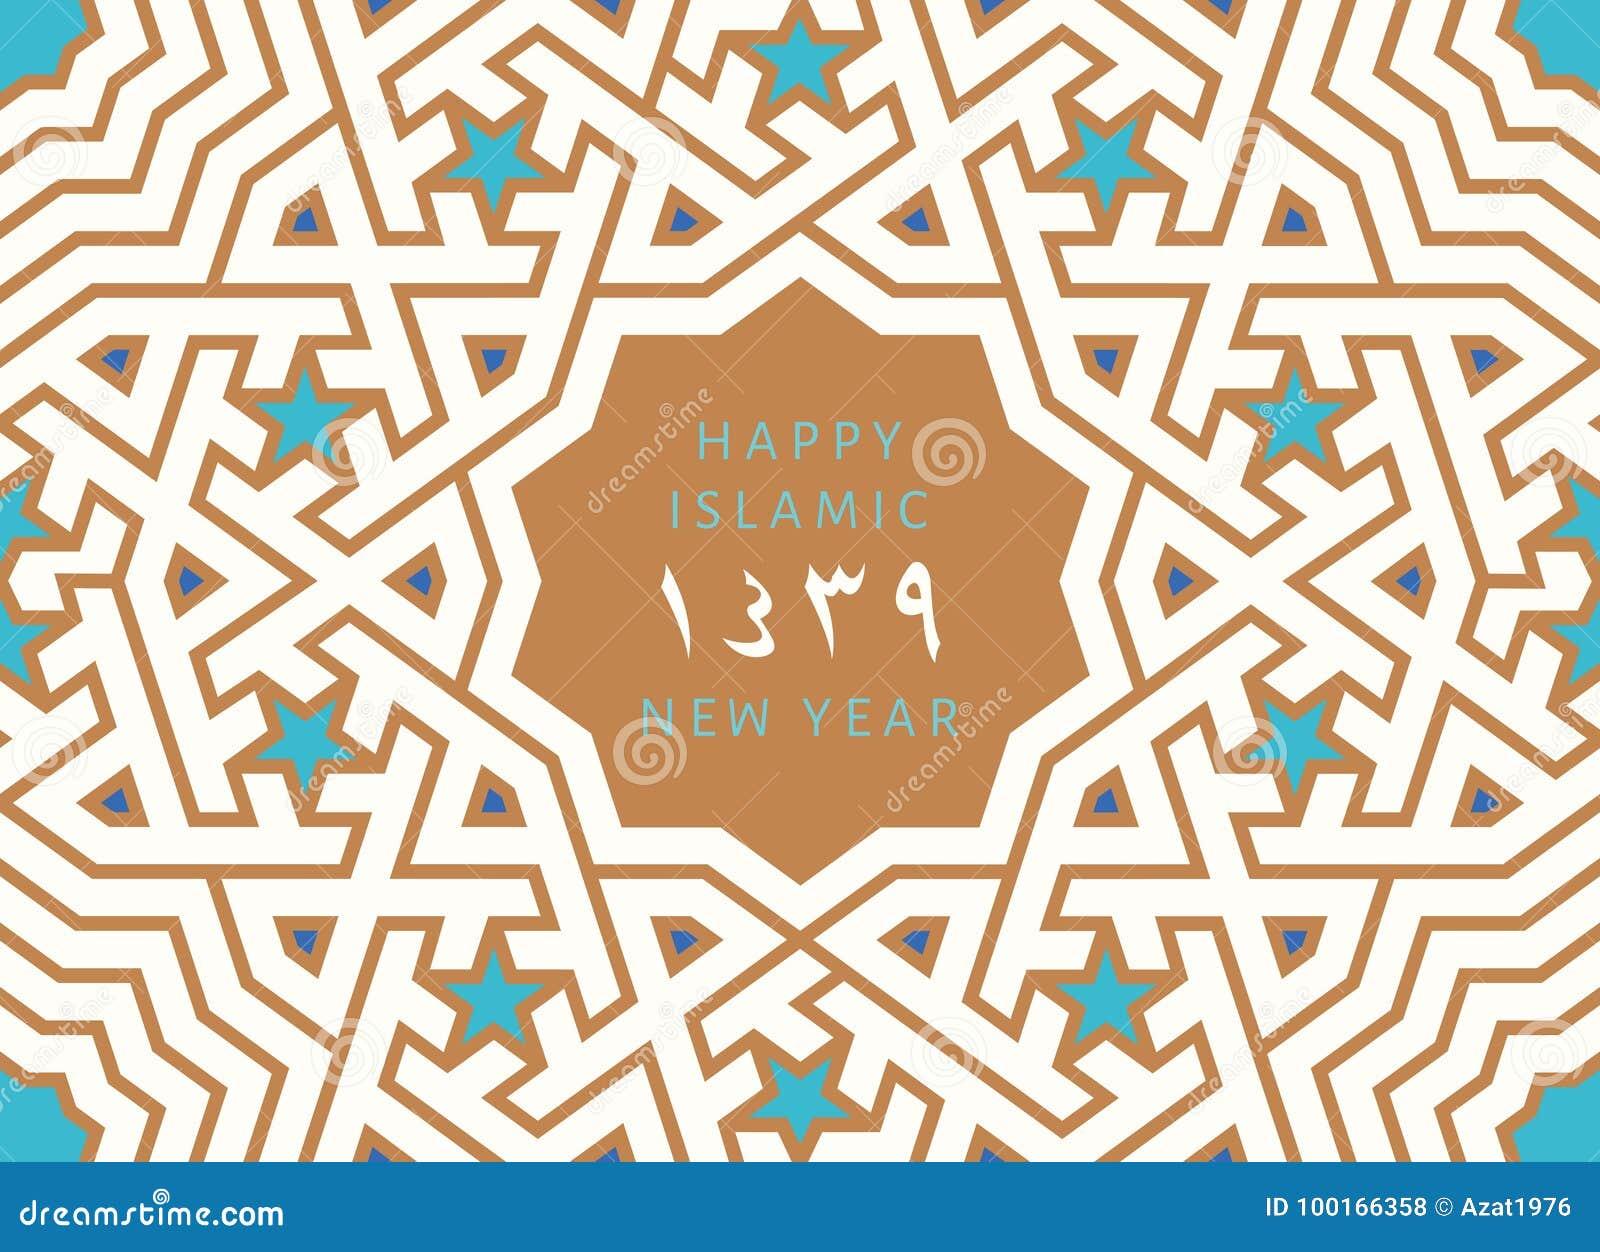 1439 Hijri Islamic New Year Card Stock Vector Illustration Of